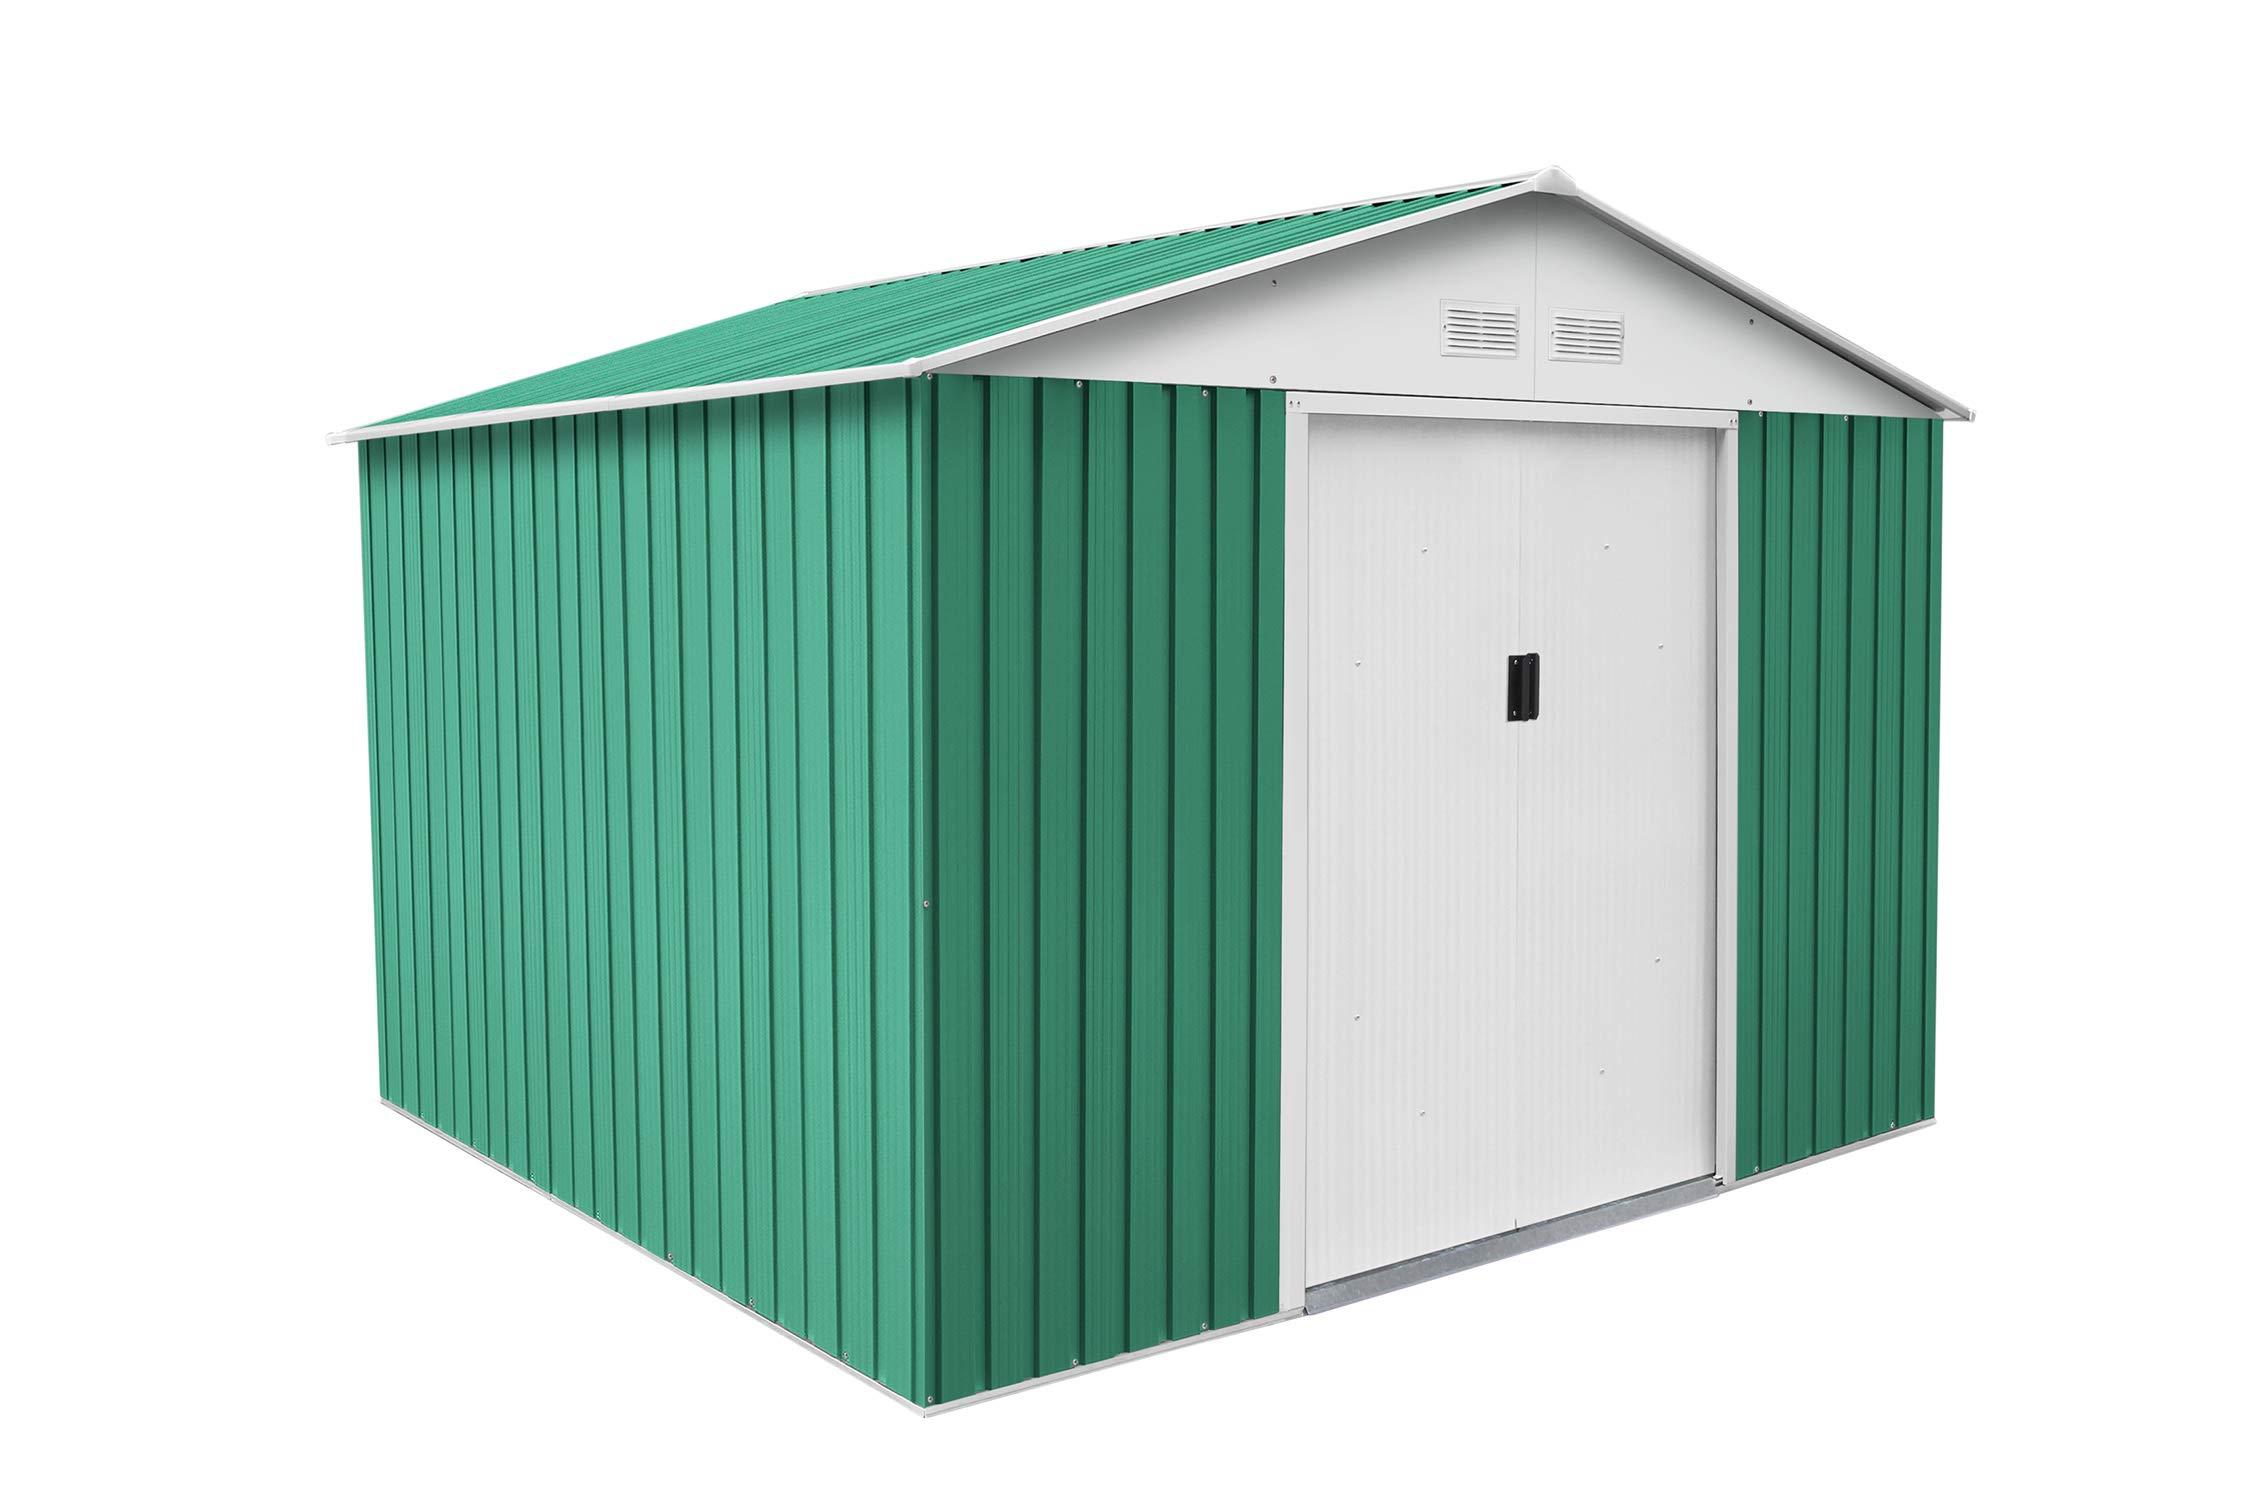 Gardiun KIS12804 - Caseta Metálica Bristol 7,74 m² Exterior ...